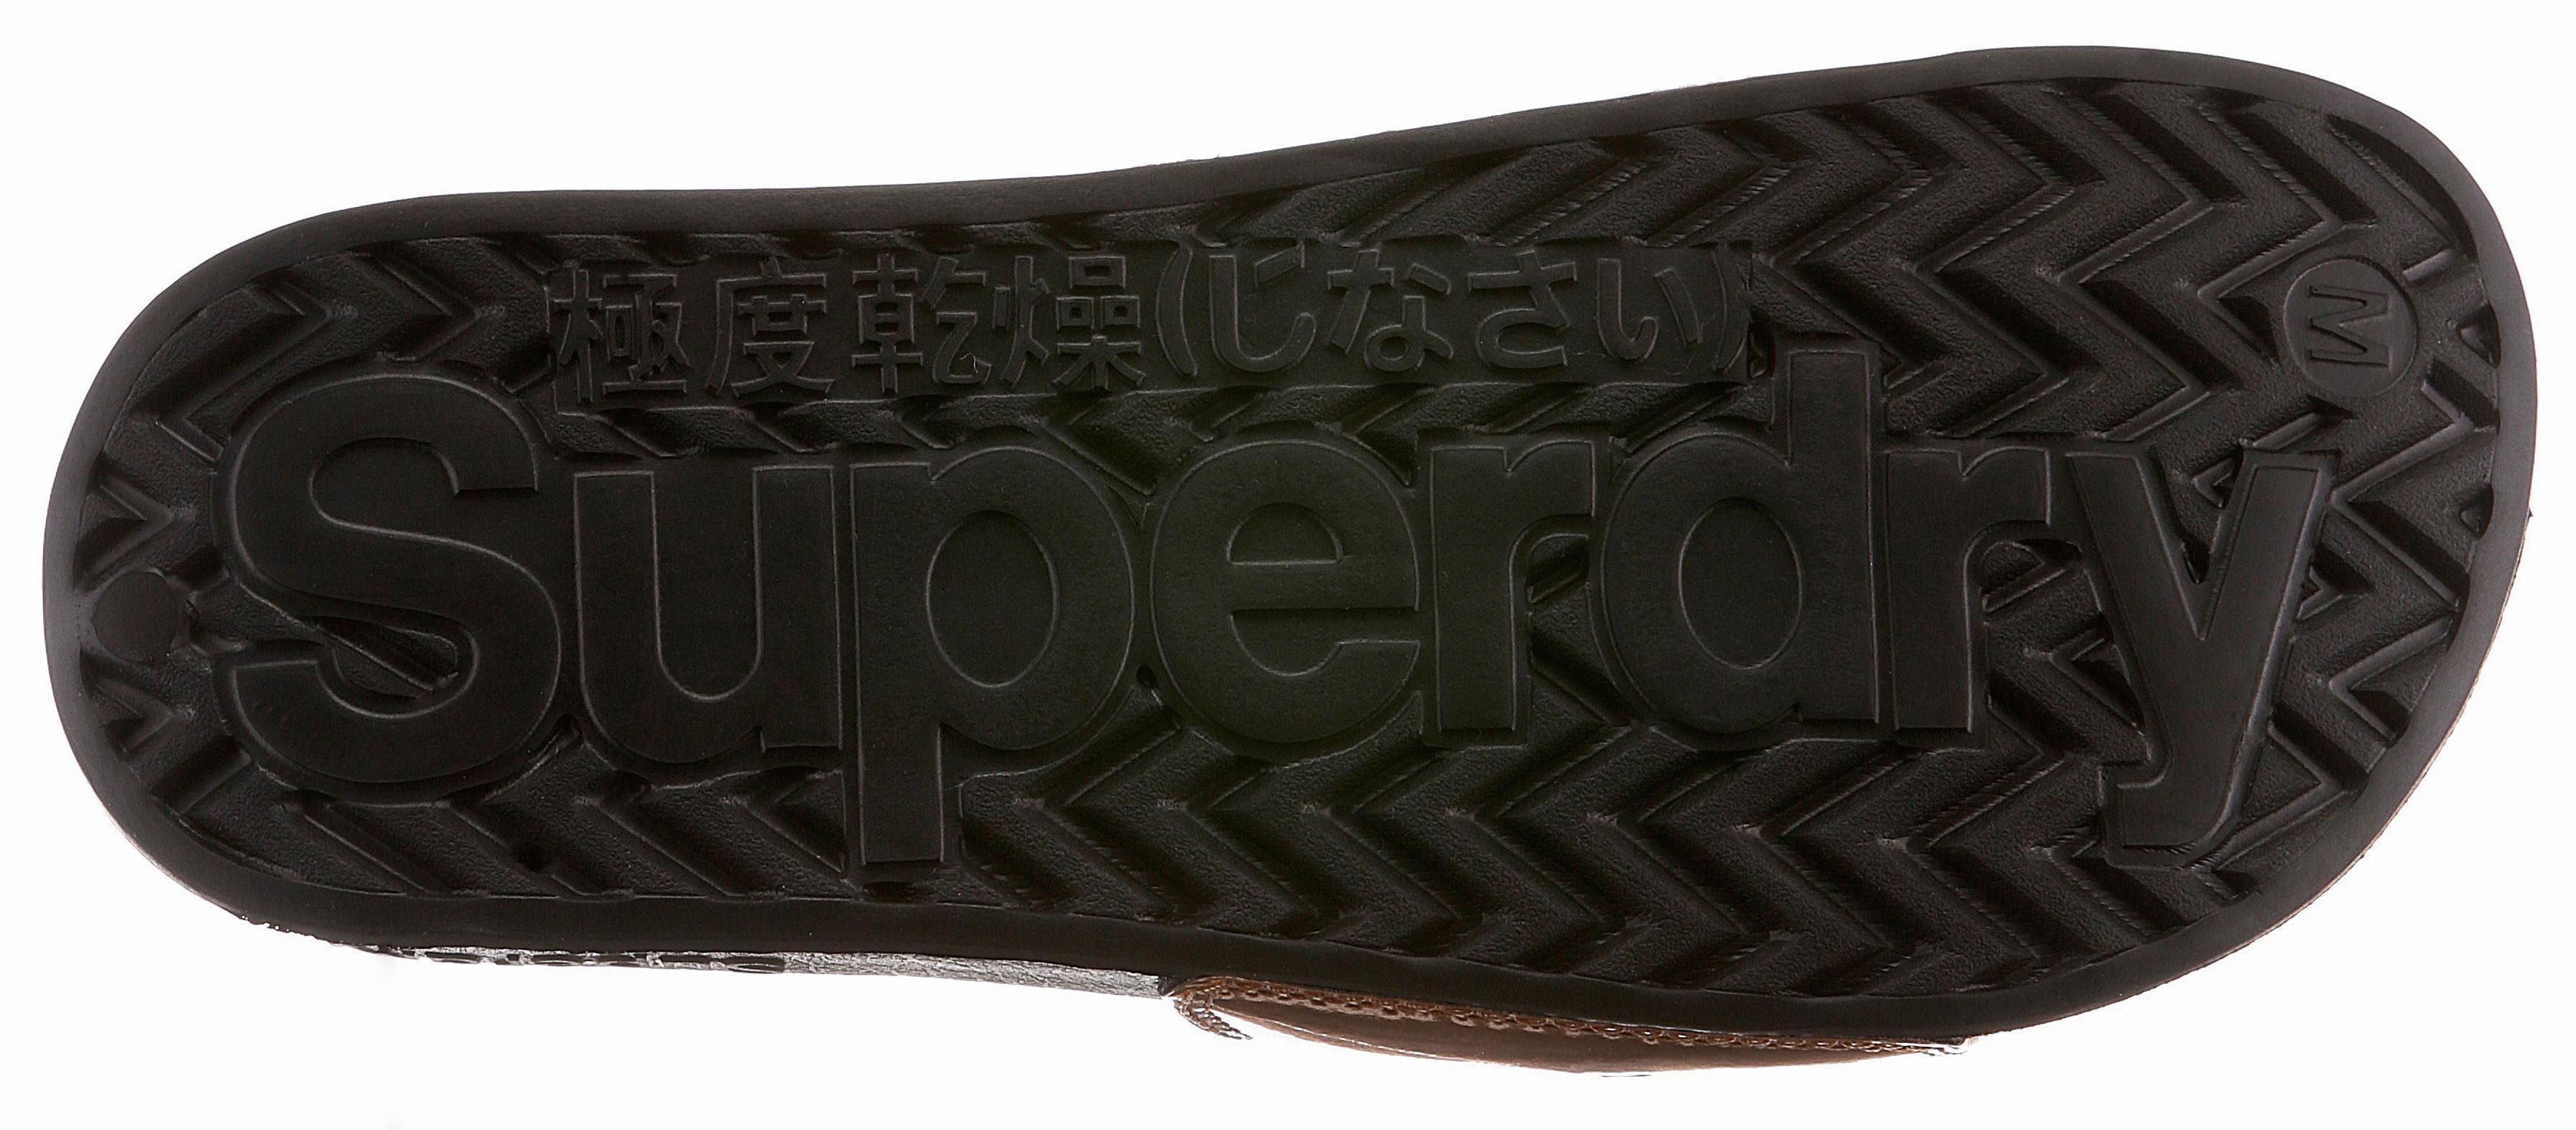 Superdry Pantolette, in Spiegeloptik online kaufen  roségoldfarben